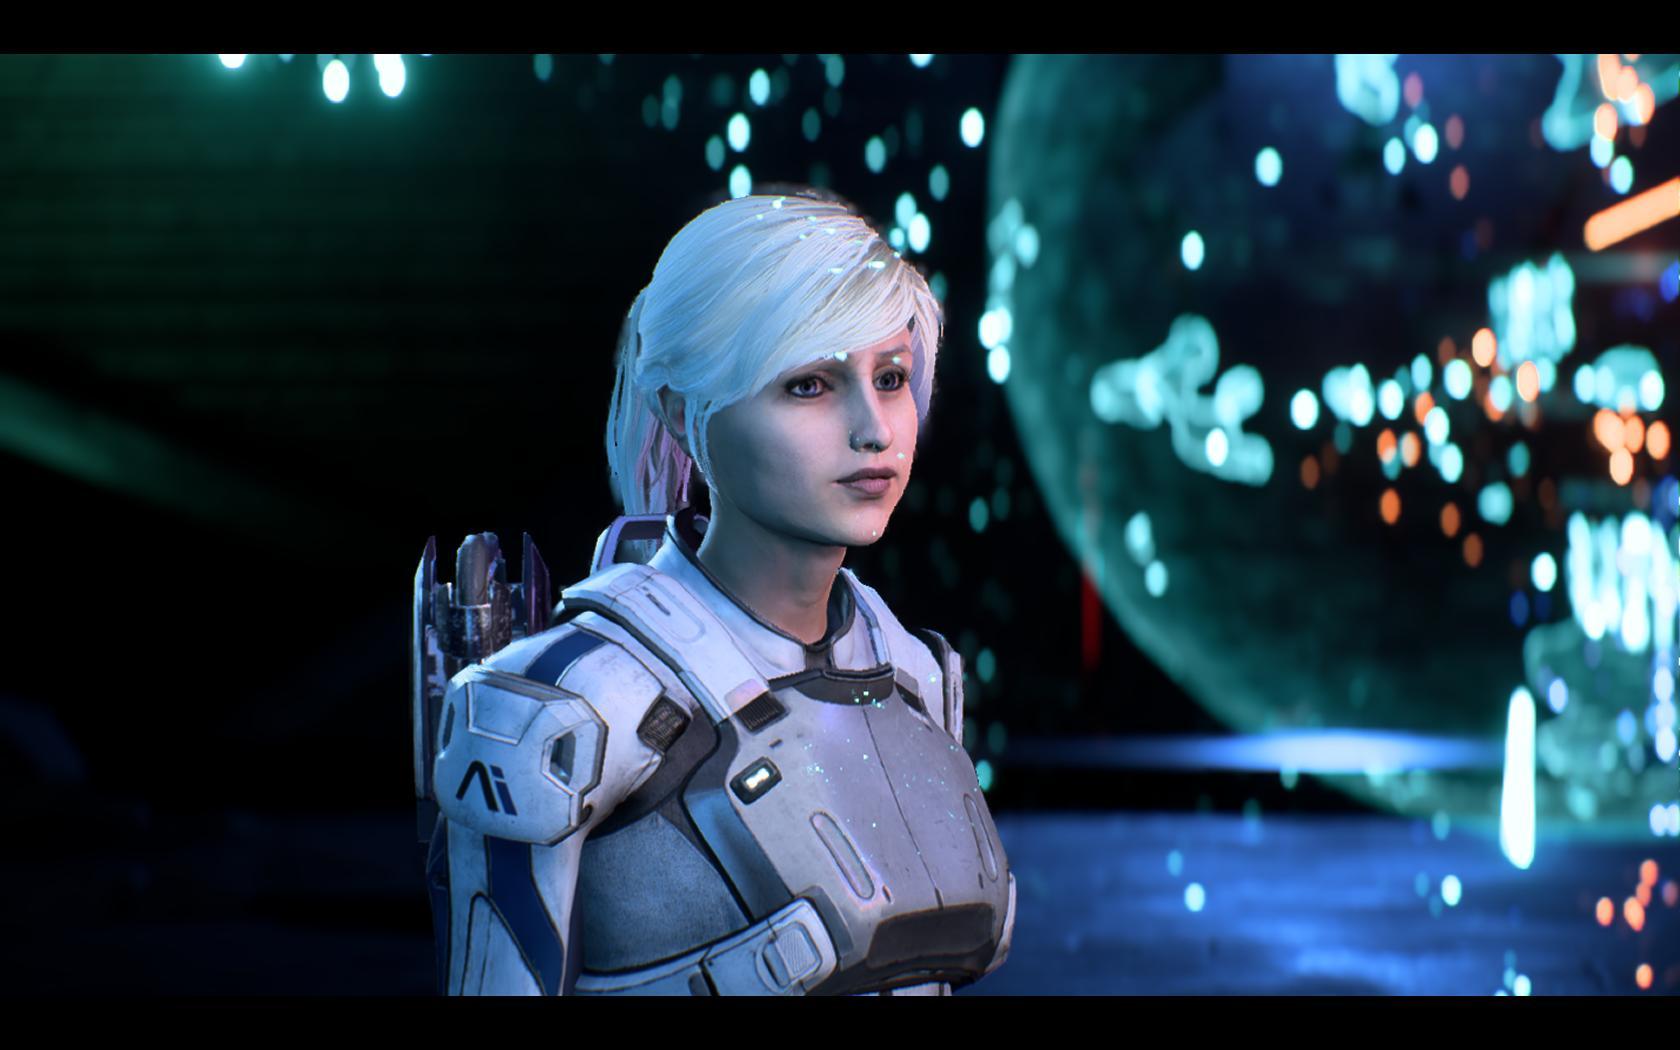 Скрины Mass Effect: Andromeda - Mass Effect: Andromeda Hamster, Ryder, Sara, Хомяк, Хомячок